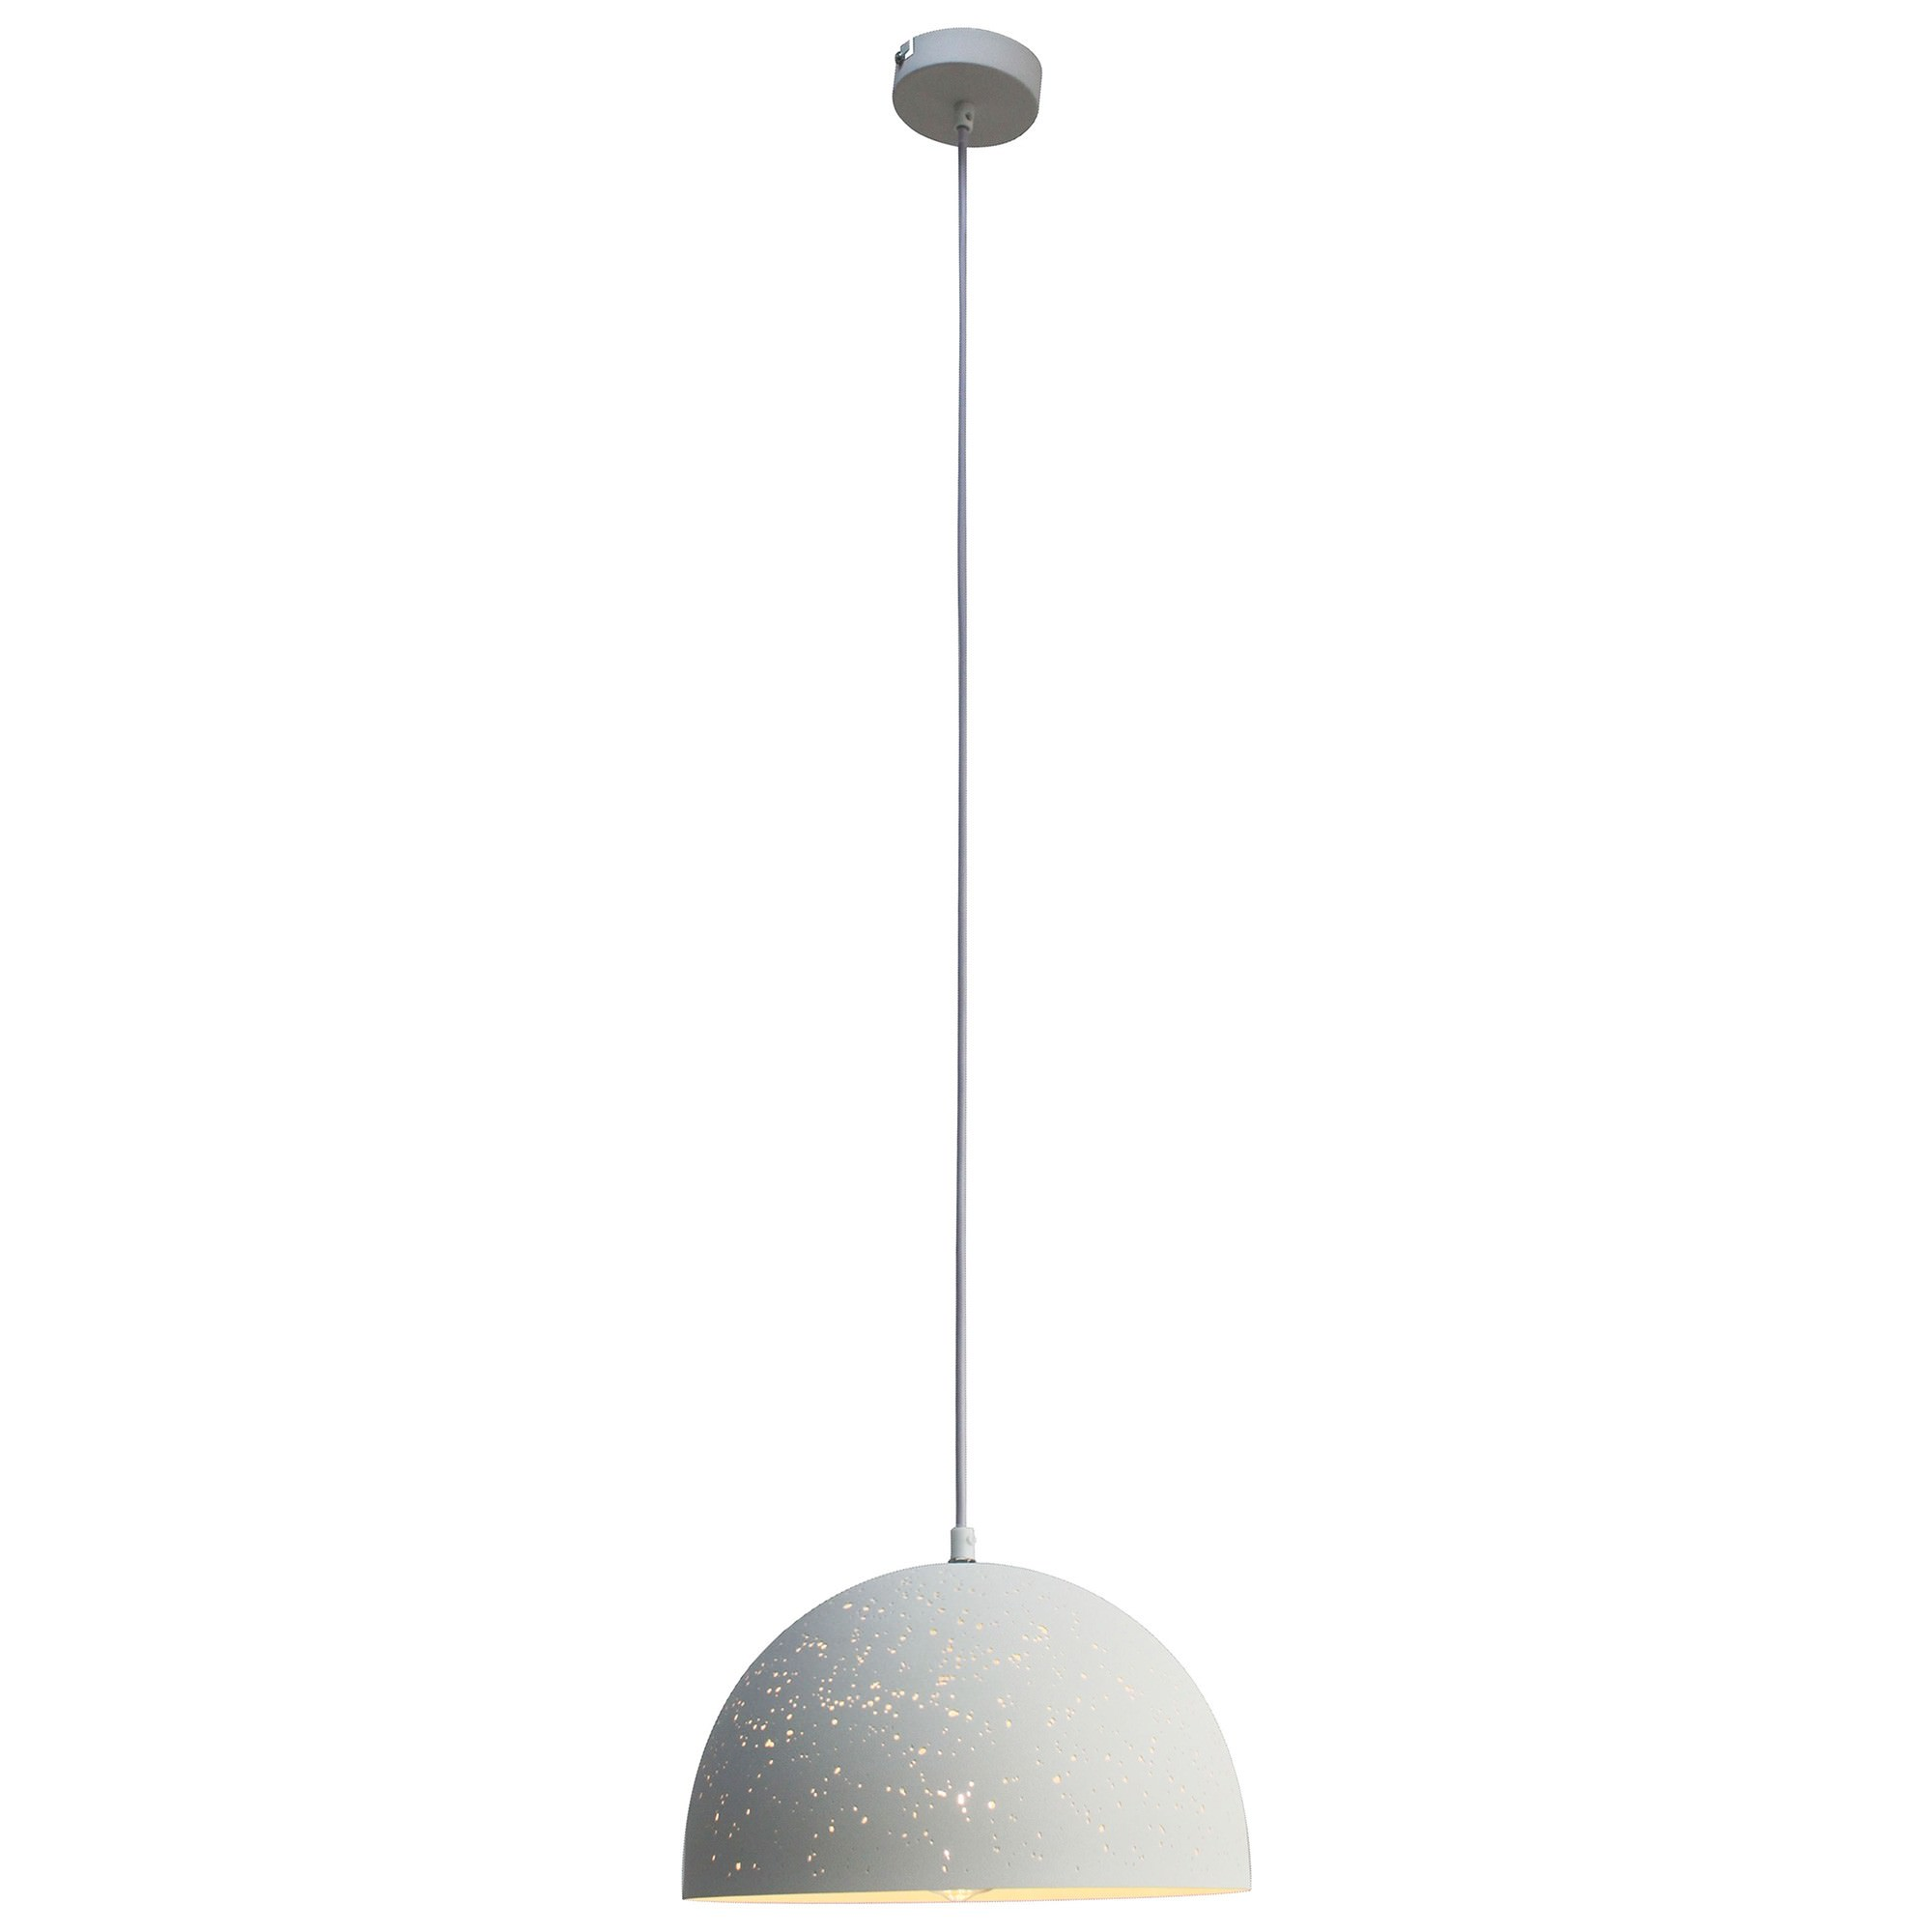 Bardem Metal Pendant Light, 30cm, White